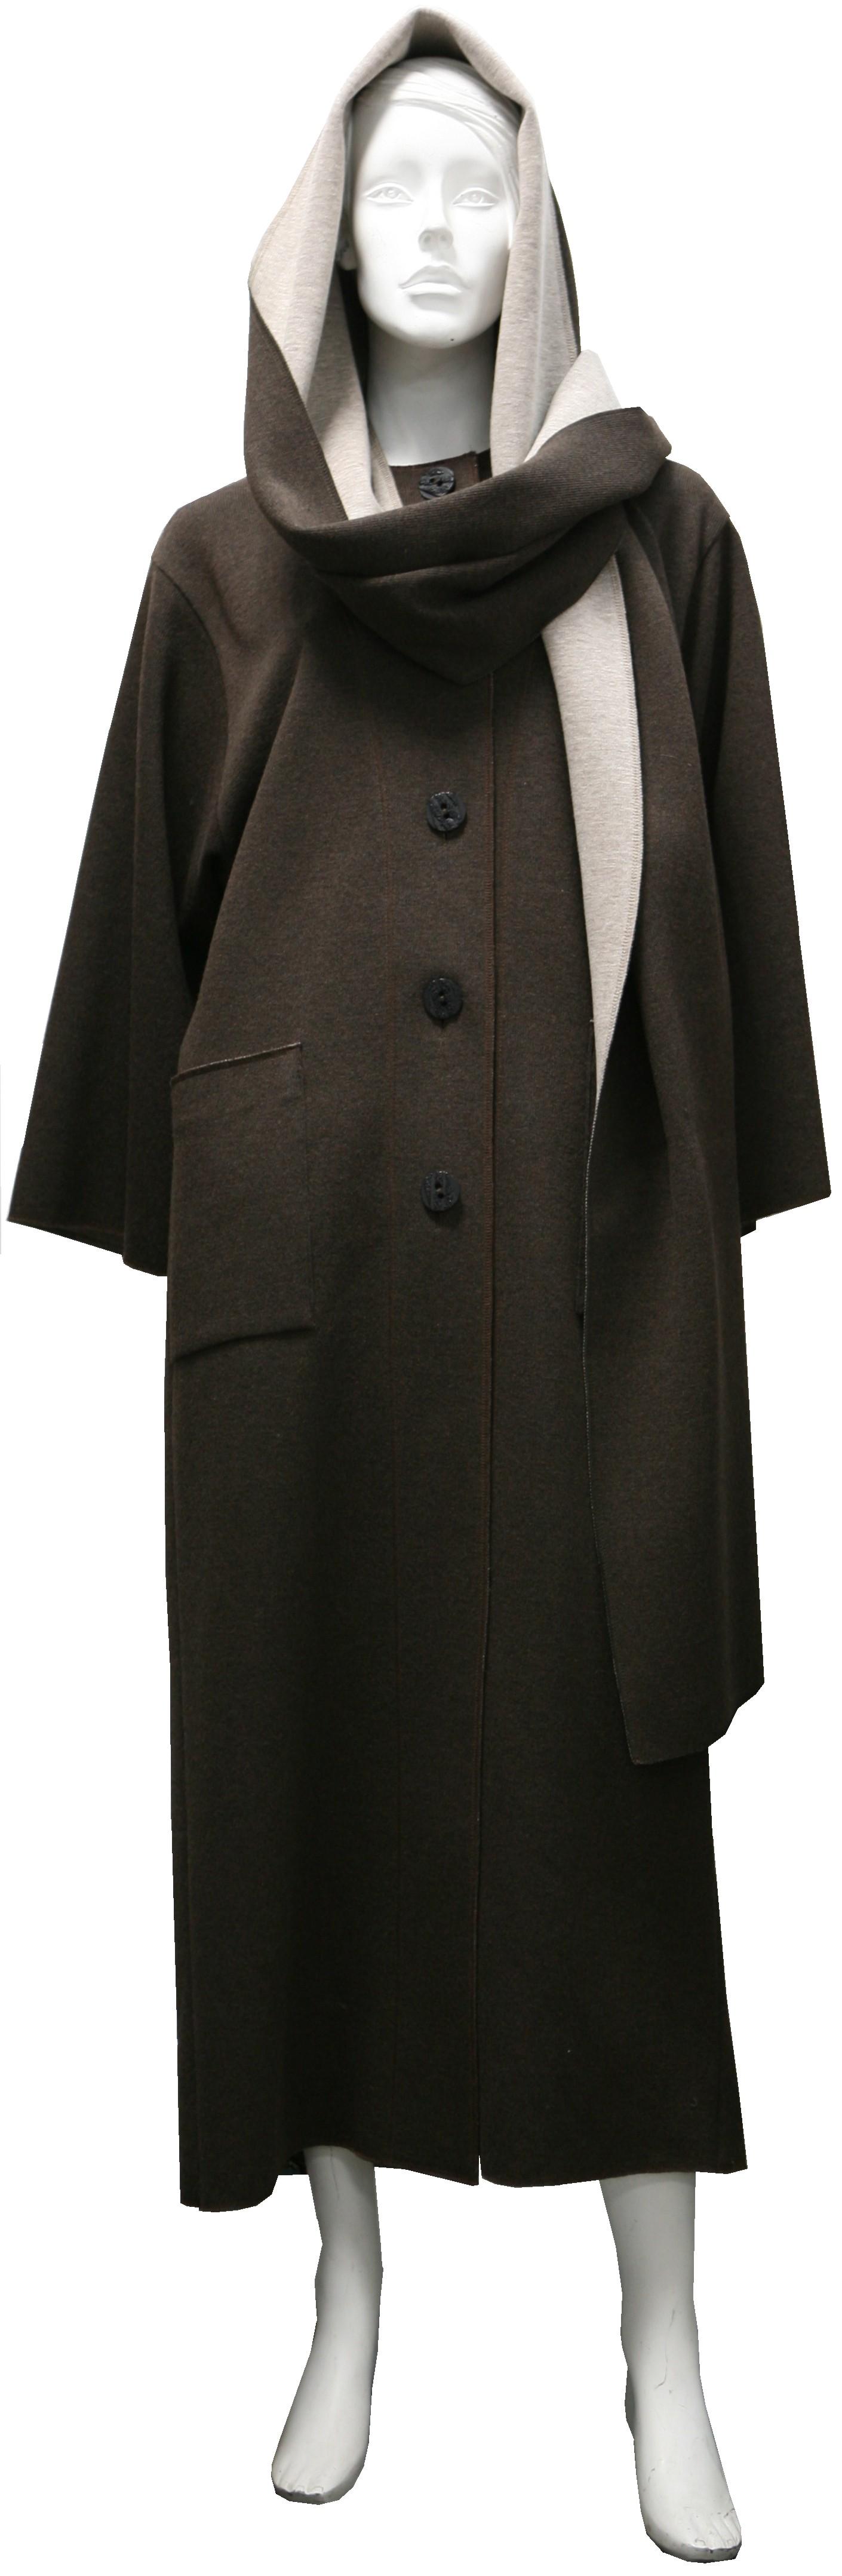 2000 184 500 пальто (00000)